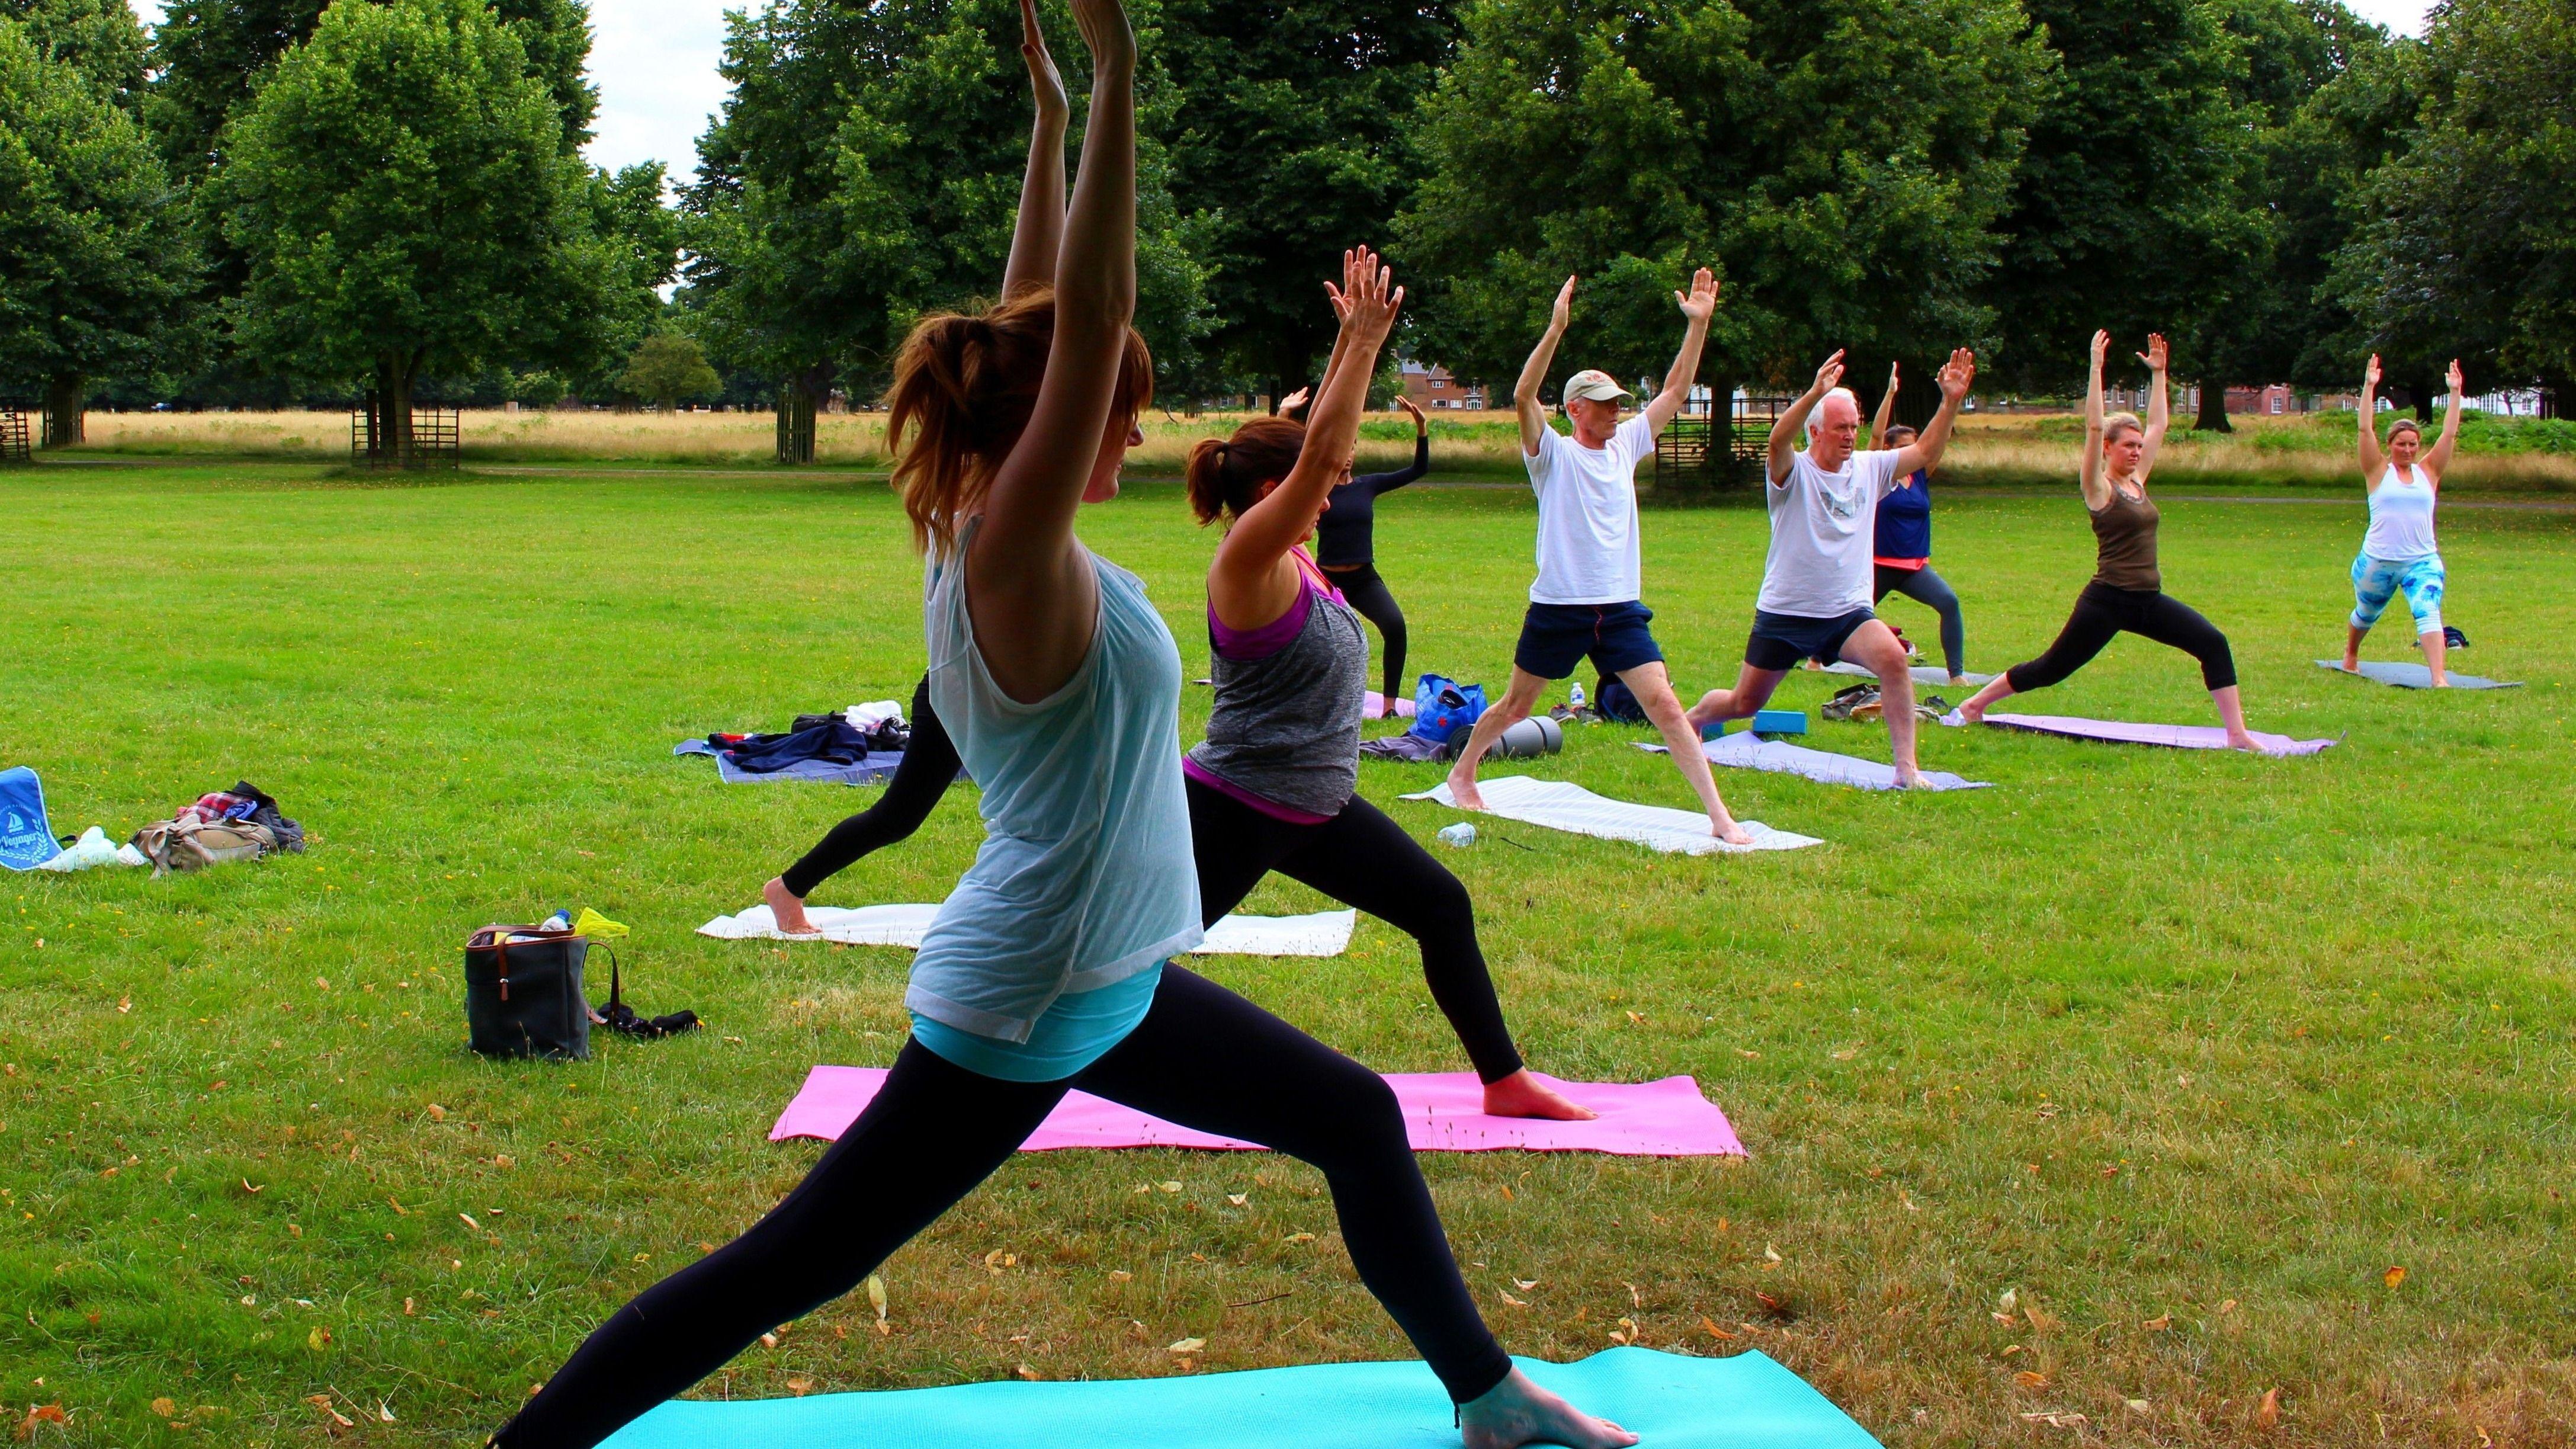 Yoga & Social Yogic Events in Kingston Upon Thames